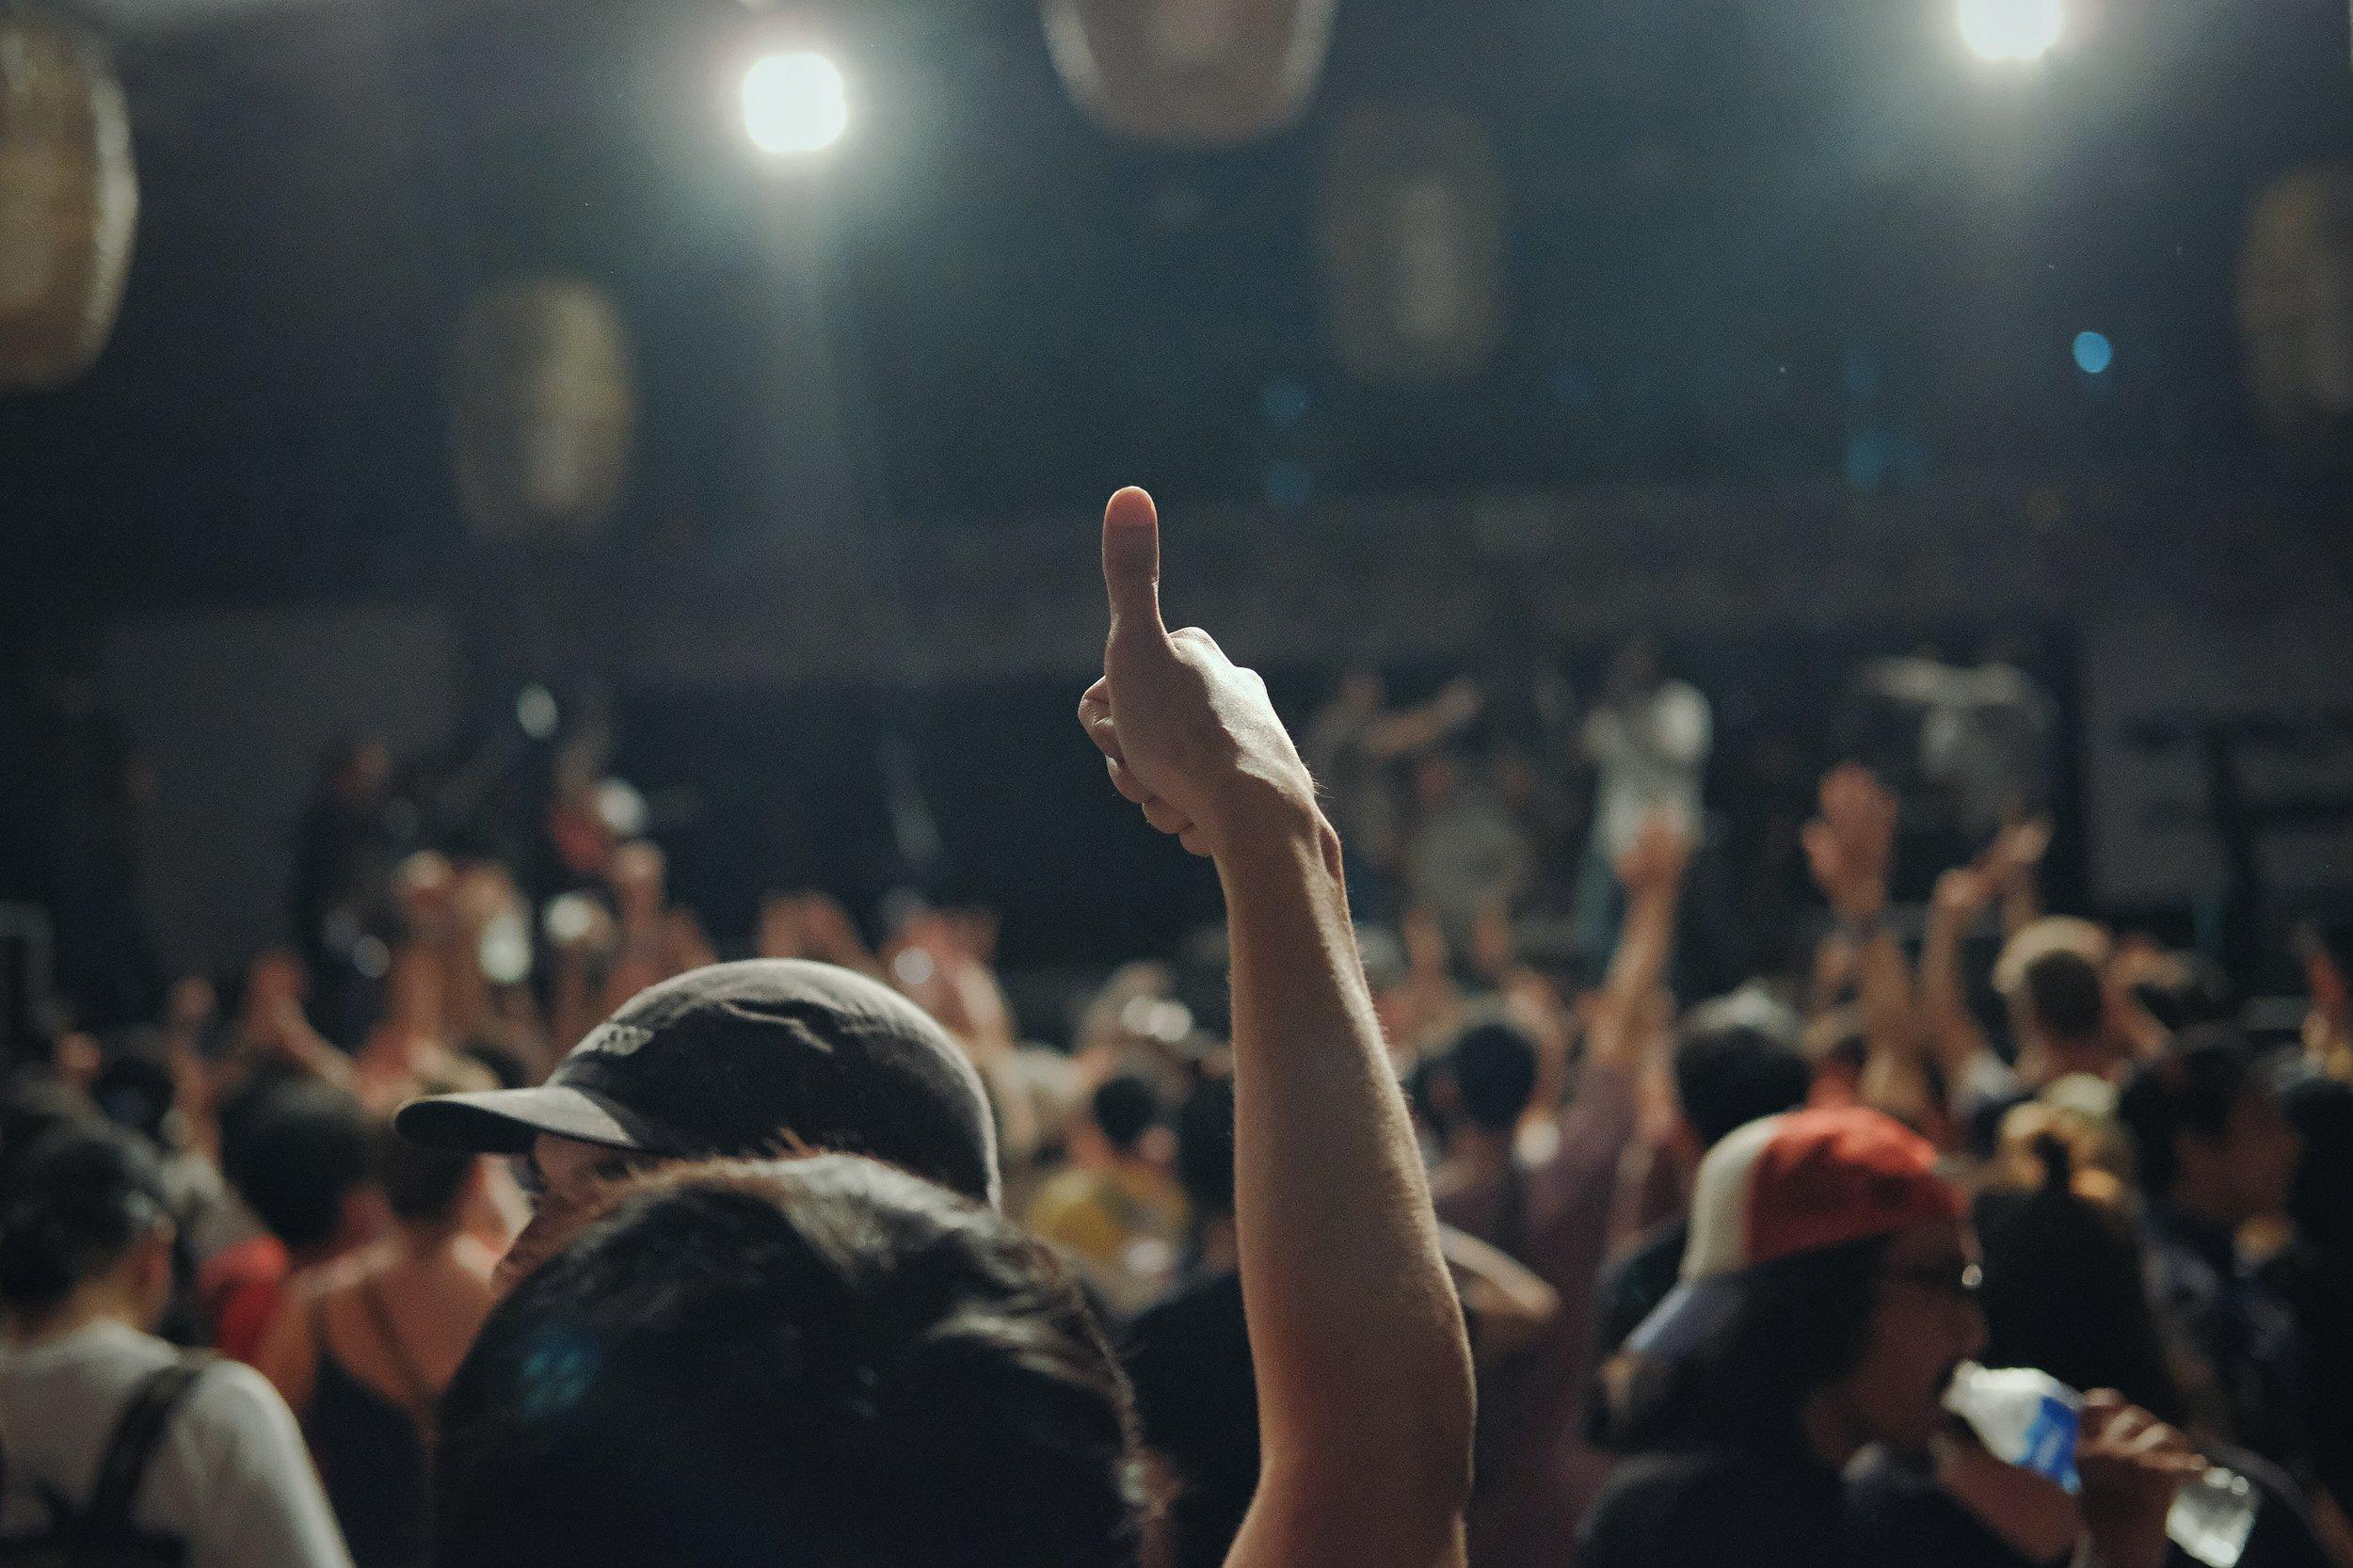 009. Crowd001.JPG